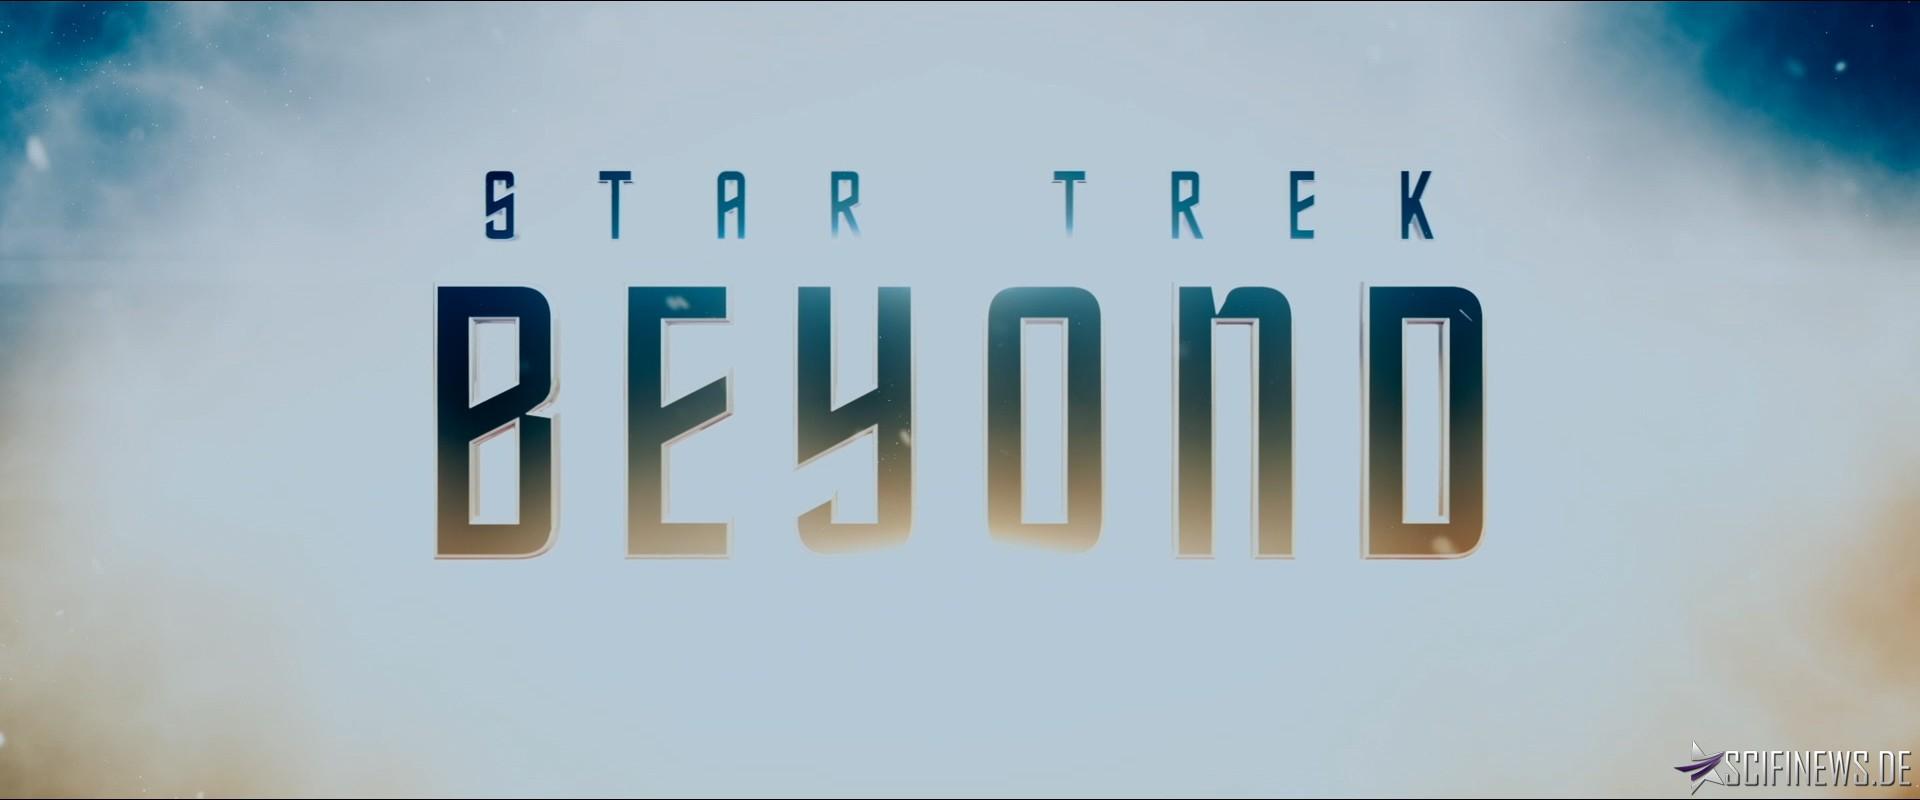 Star Trek Beyond - Logo